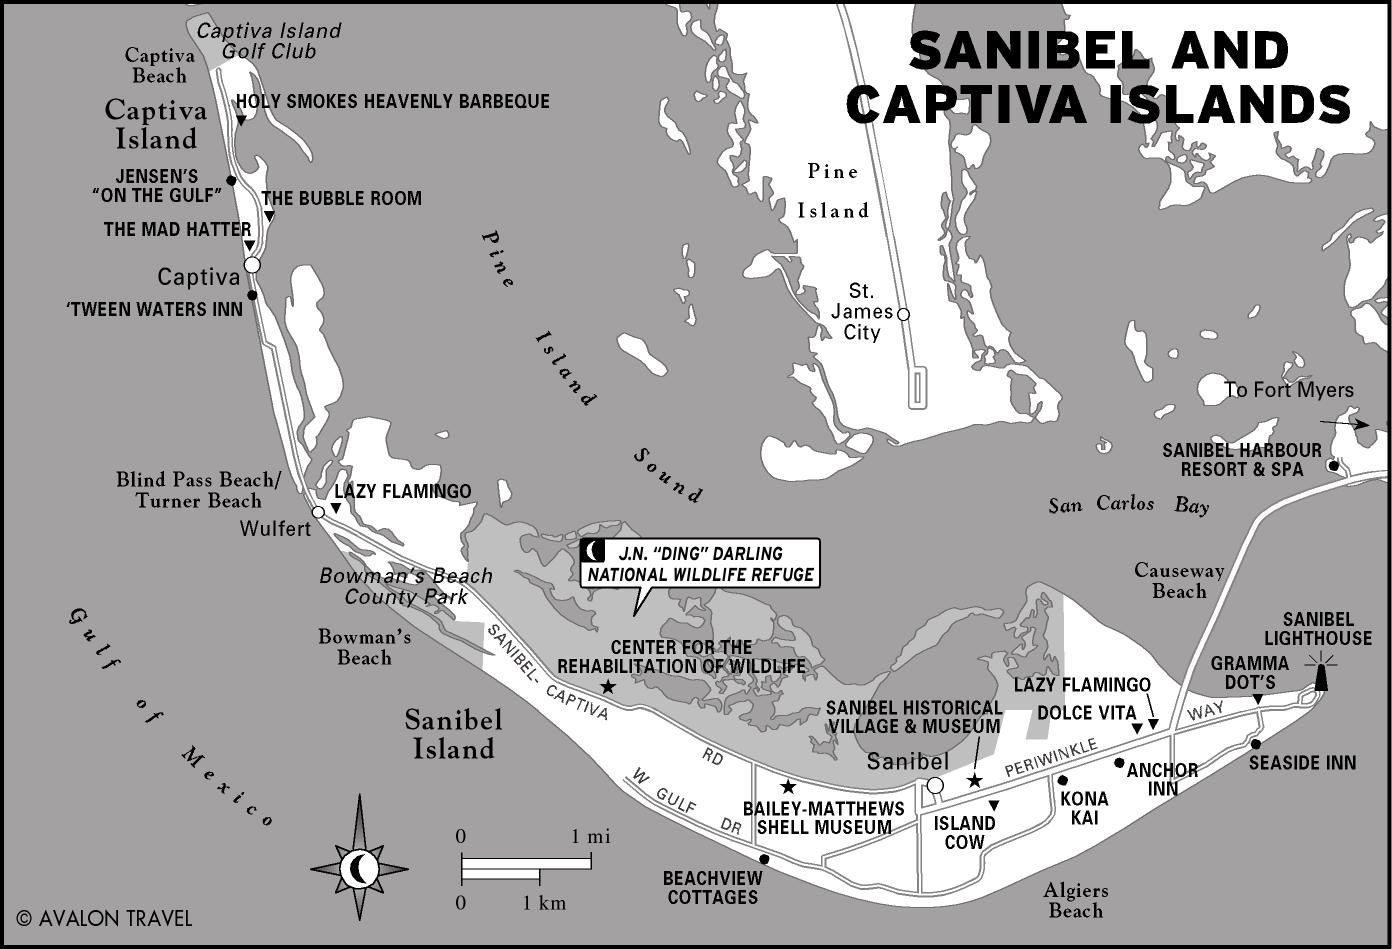 Printable Travel Maps Of Florida And The Gulf Coast Florida